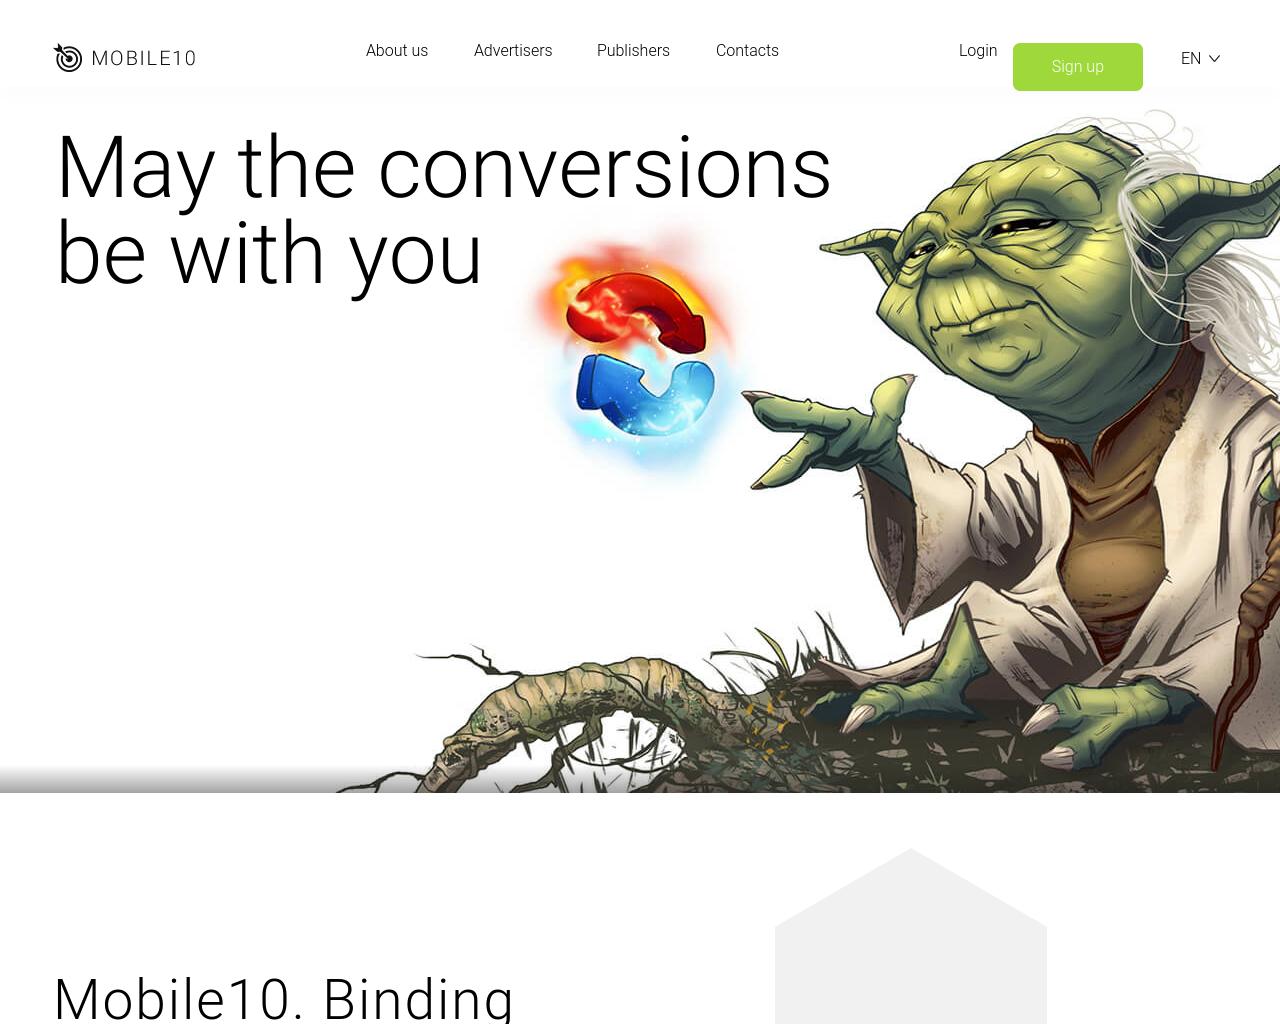 Mobile10-Advertising-Reviews-Pricing